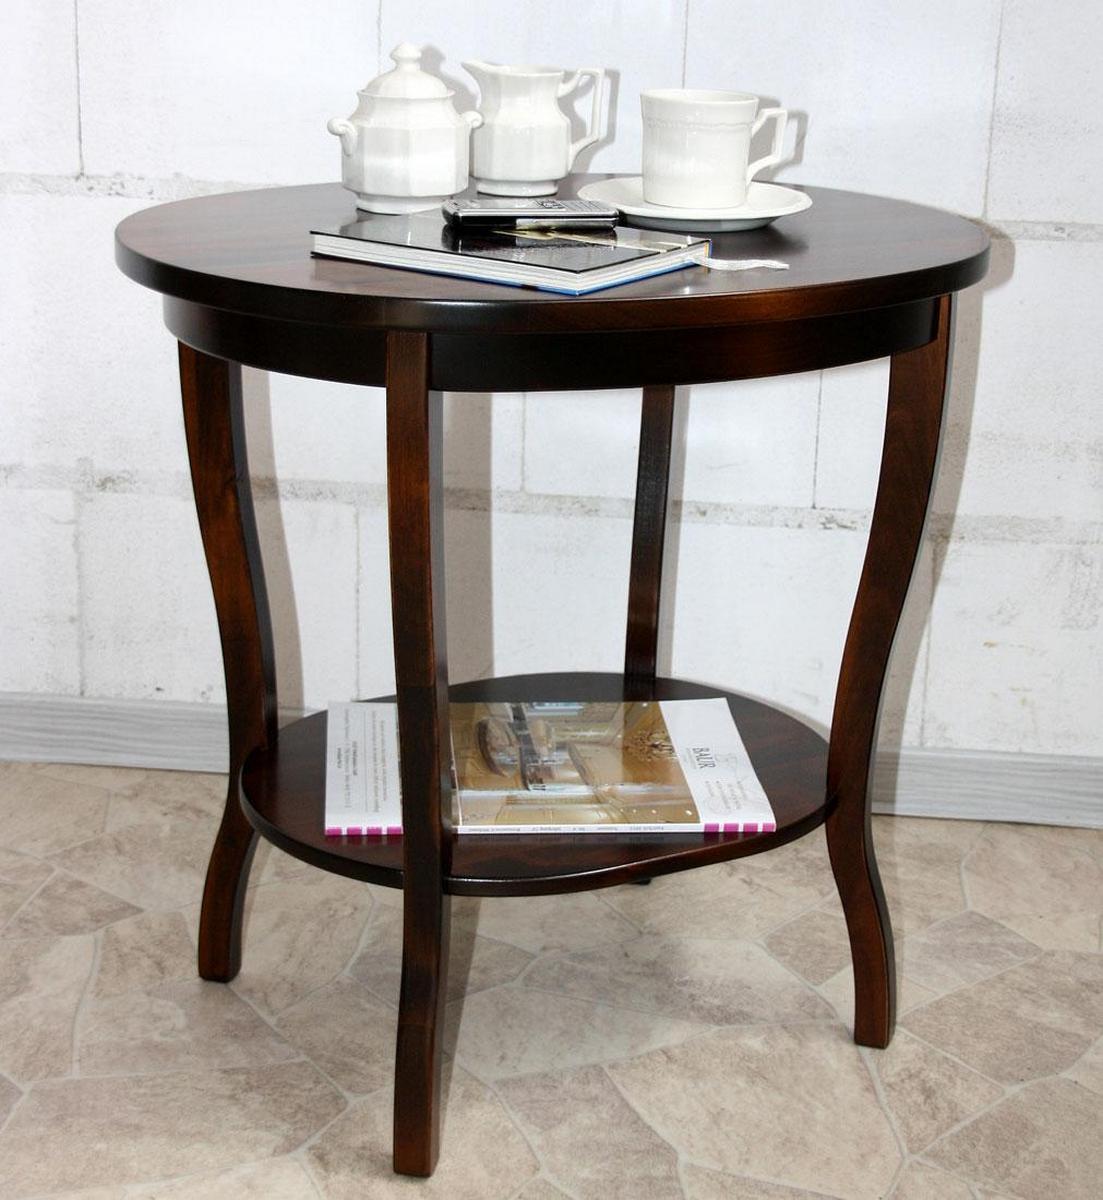 massivholz beistelltisch kolonial decor sofatisch oval nussbaum braun lackiert. Black Bedroom Furniture Sets. Home Design Ideas